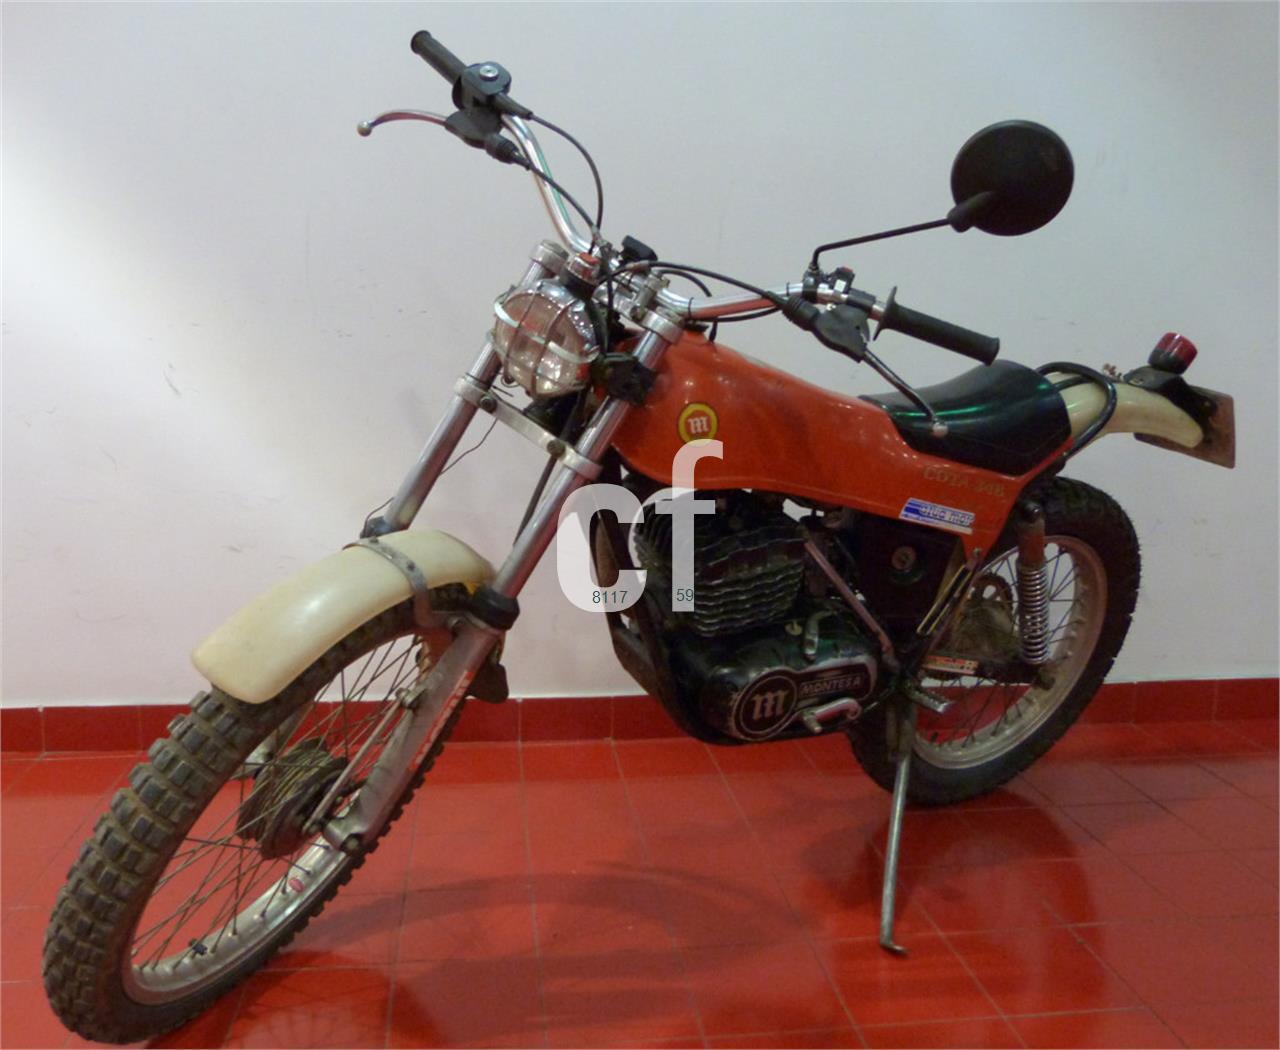 MONTESA Cota 348 de venta